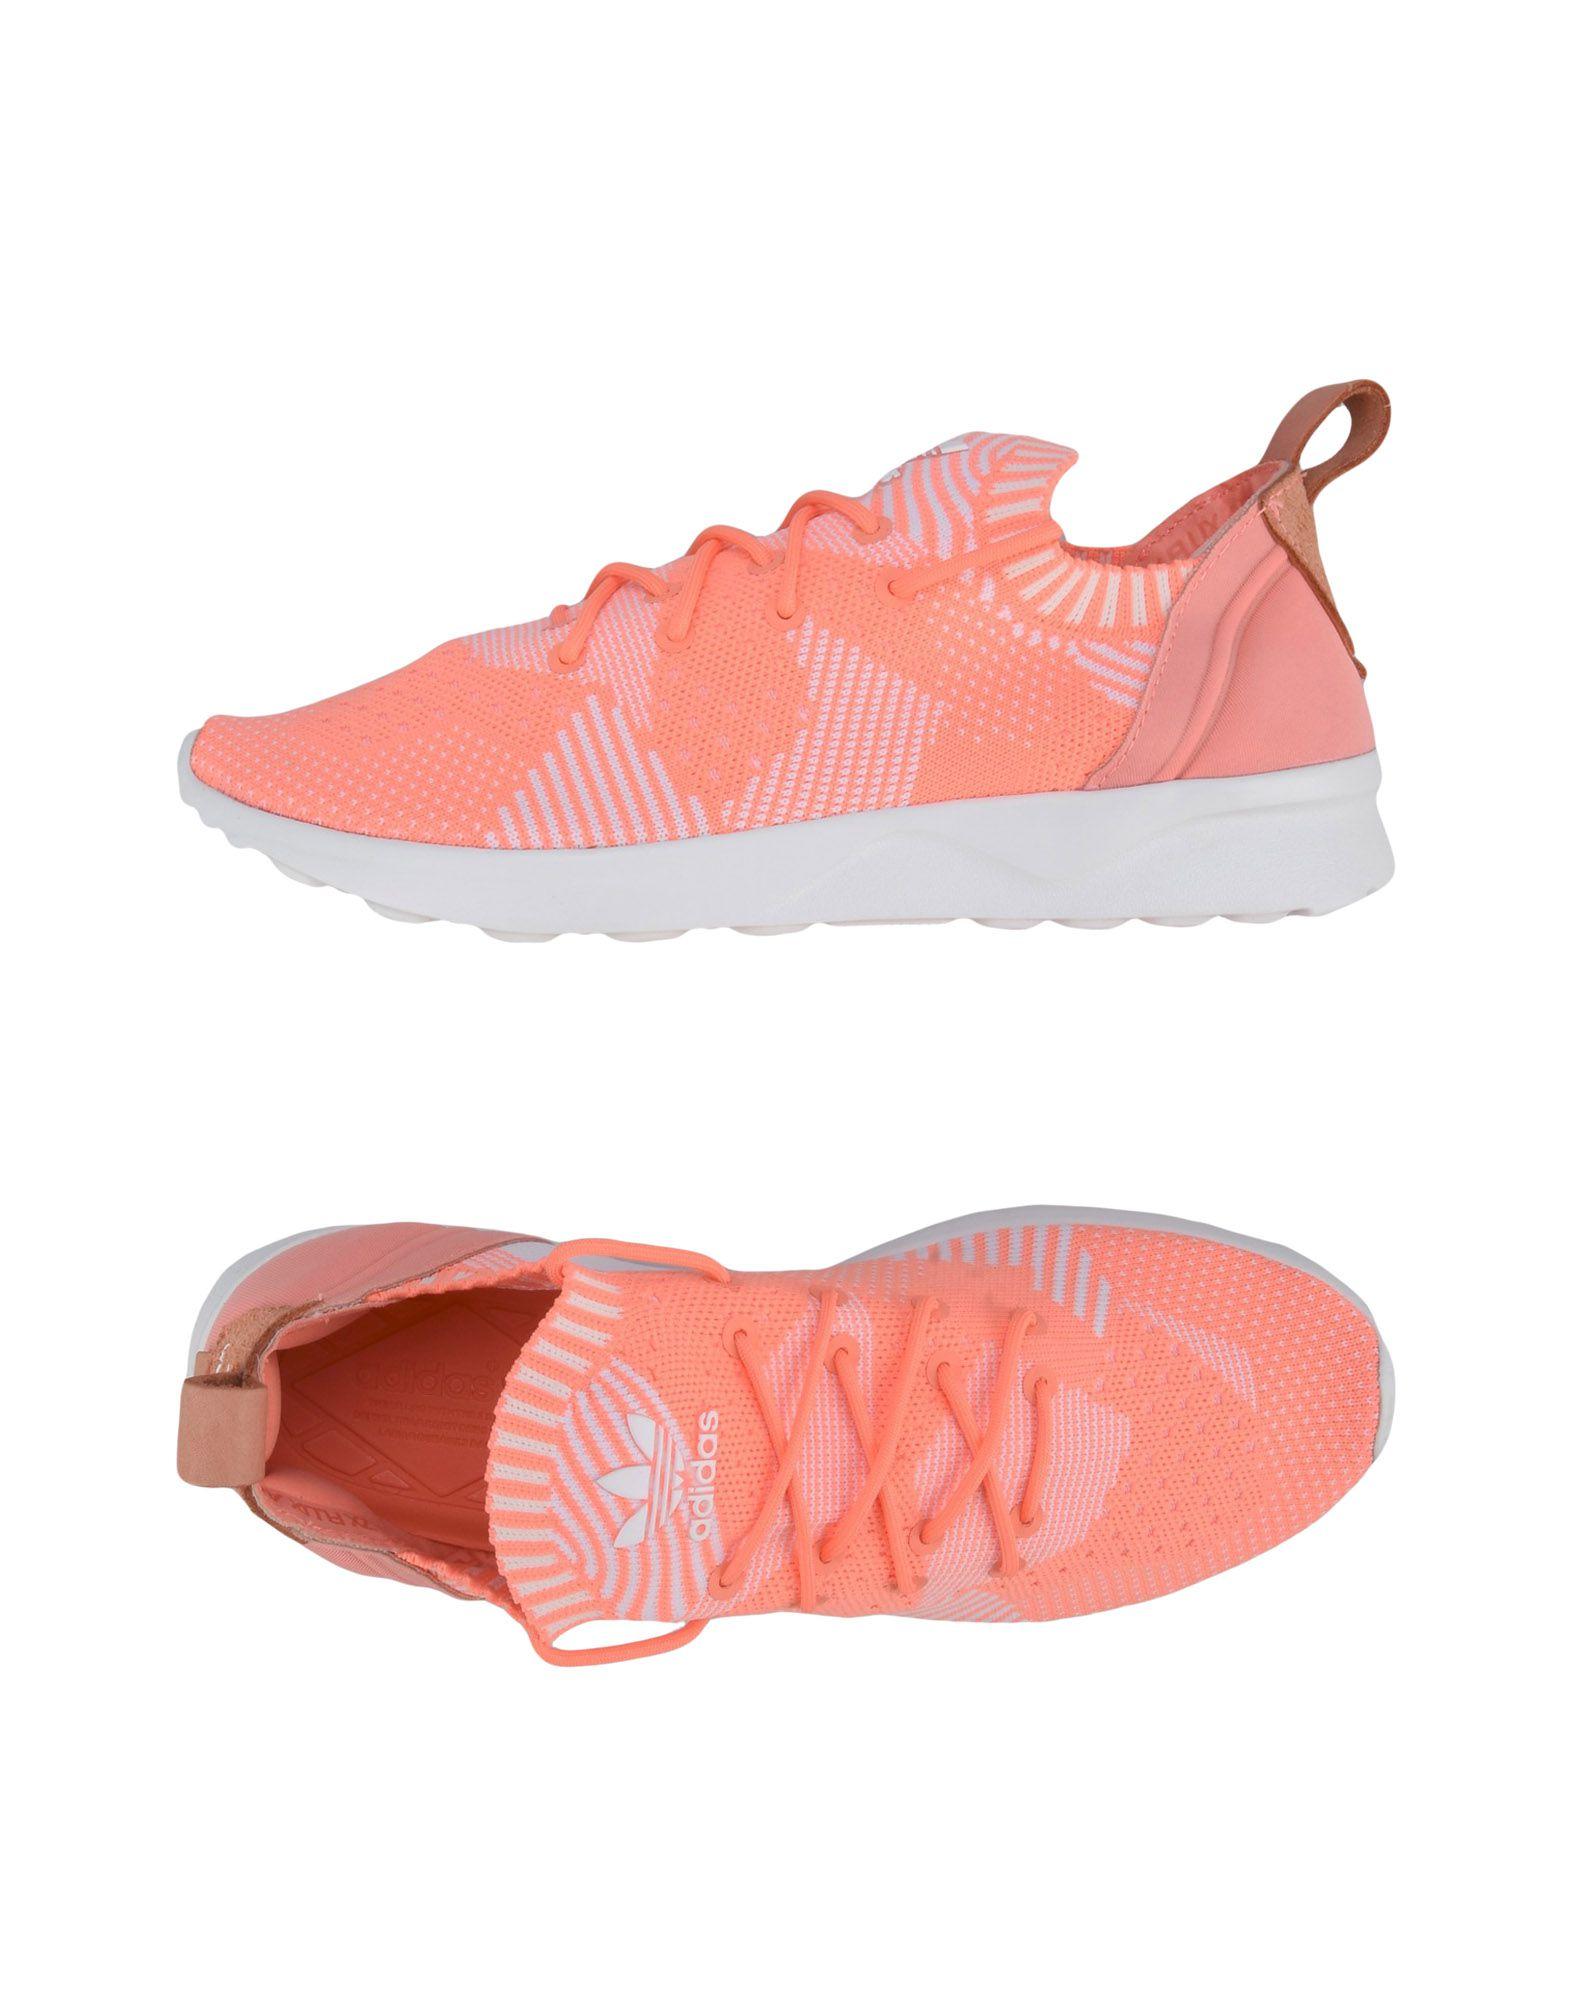 Sneakers Adidas Originals Zx Flux Adv Virtue - Donna - 11231576AR